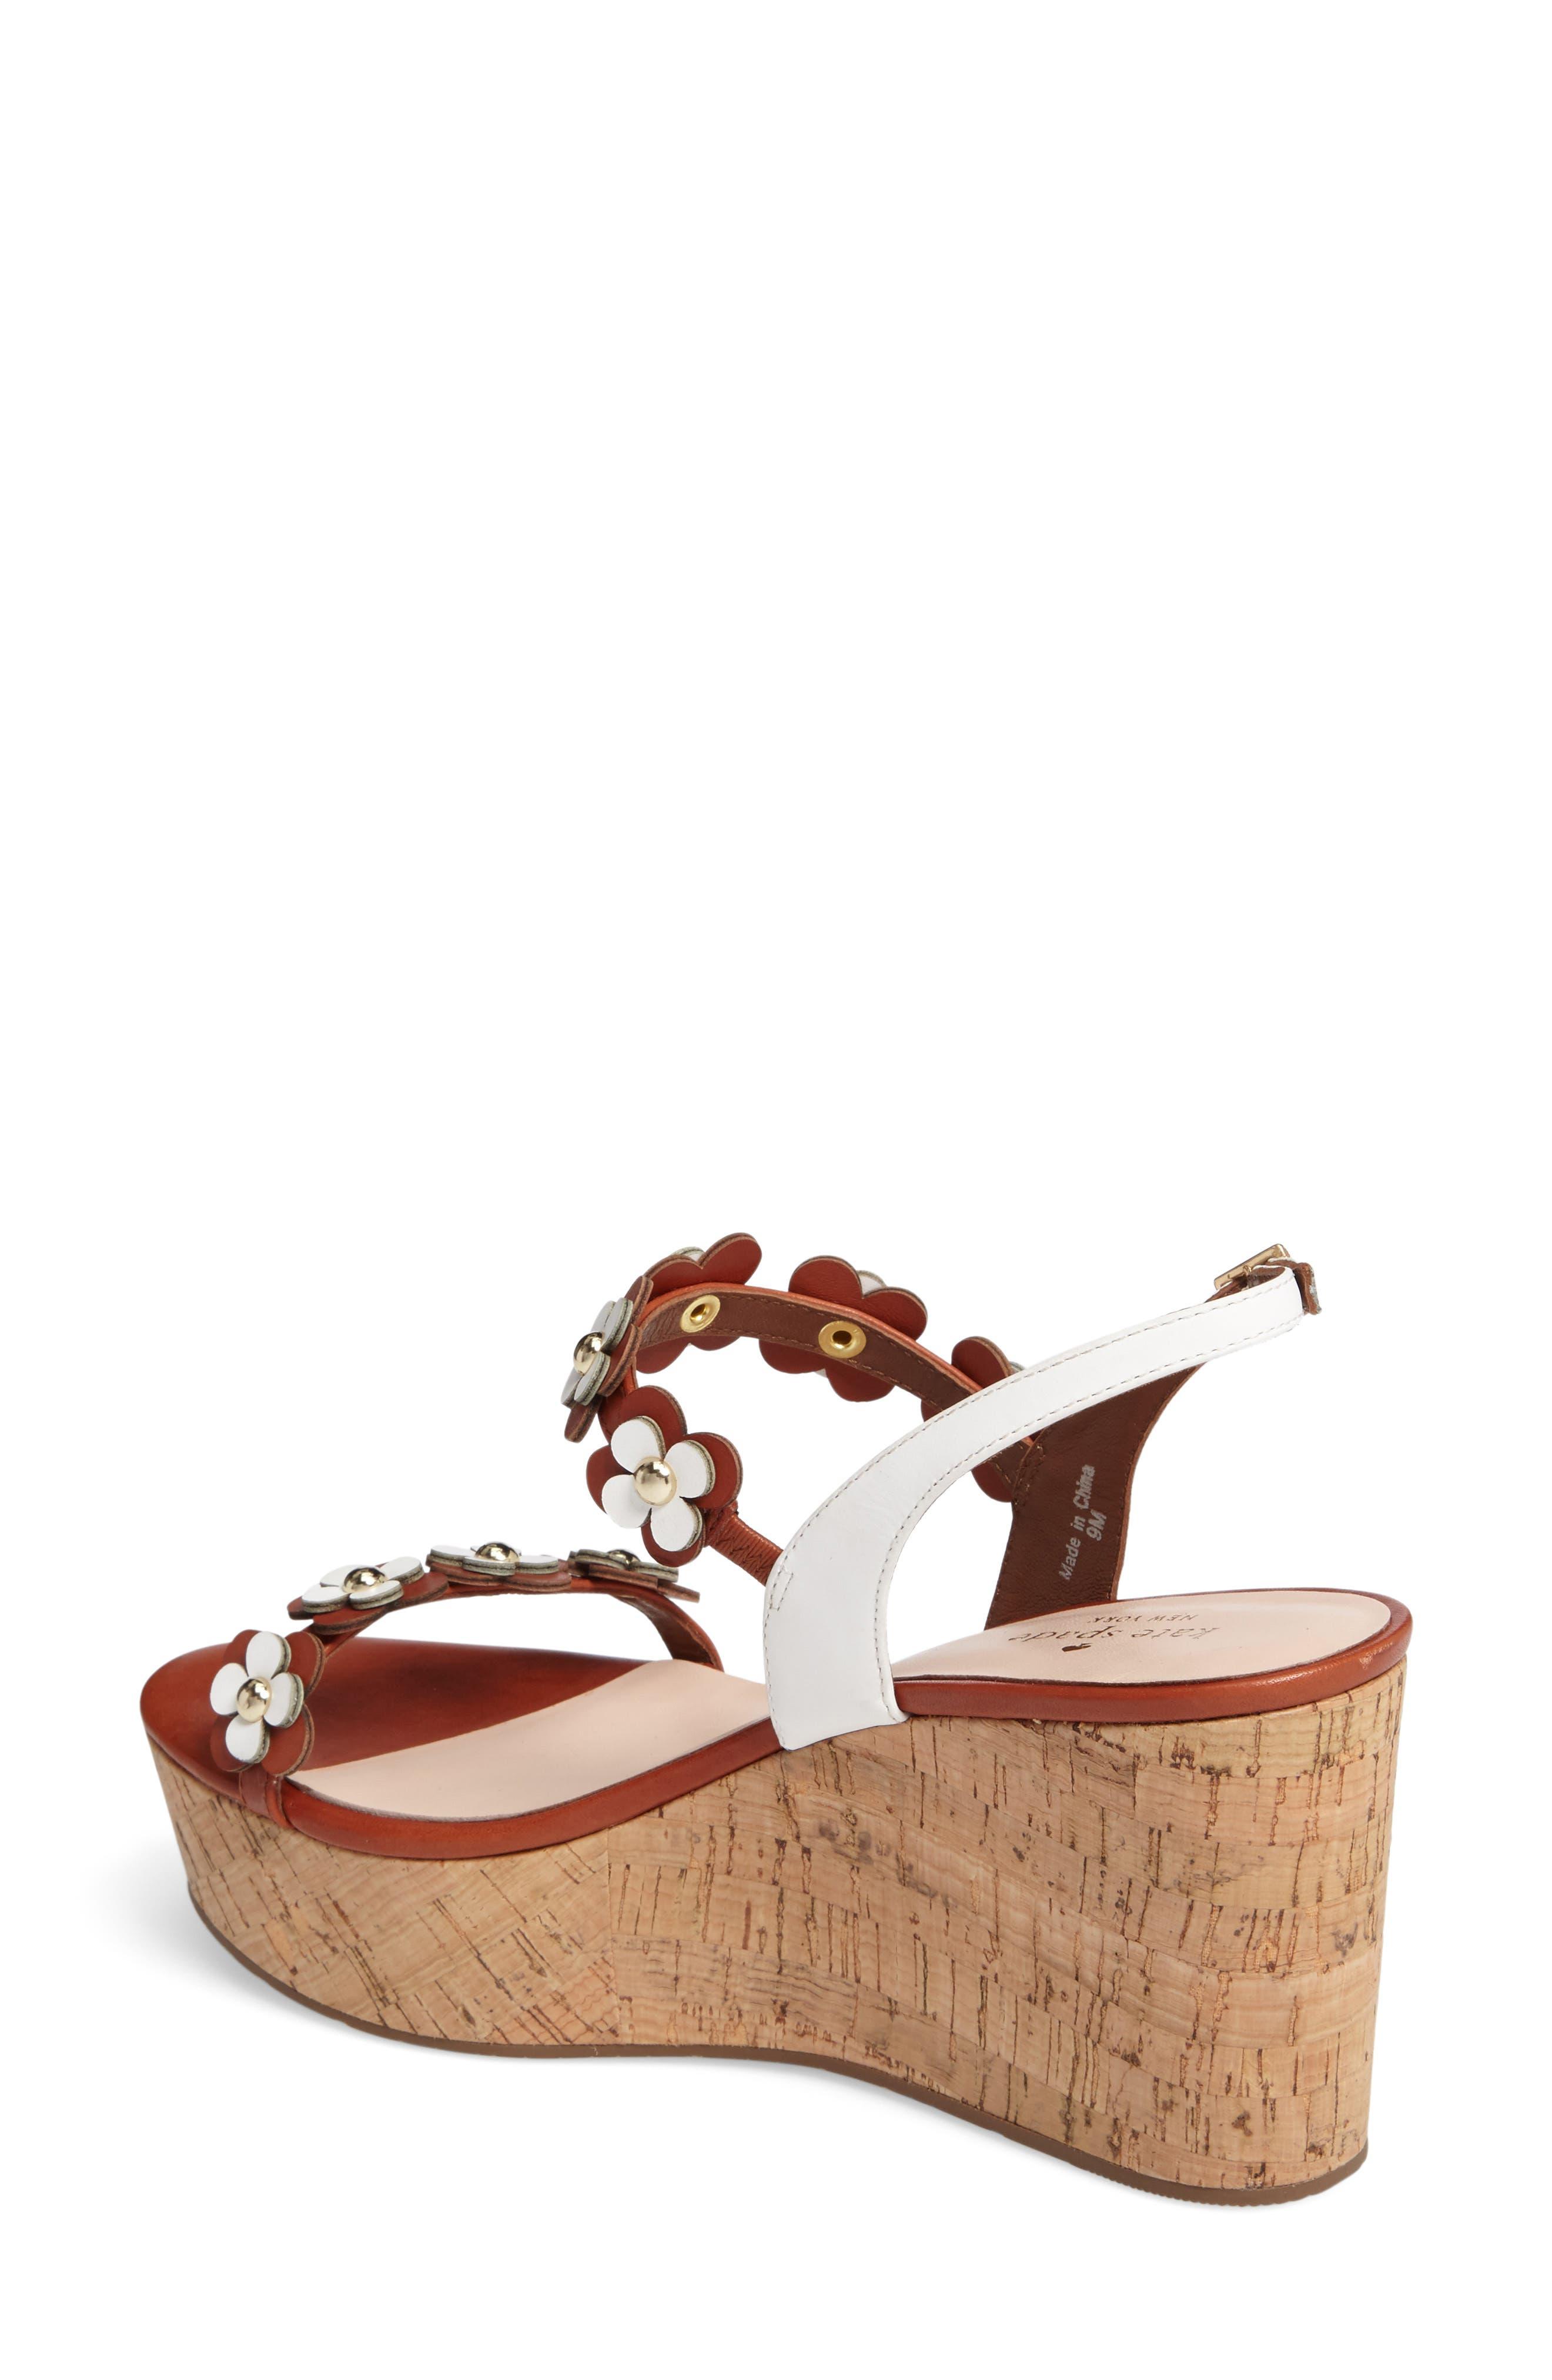 tisdale platform wedge sandal,                             Alternate thumbnail 2, color,                             200